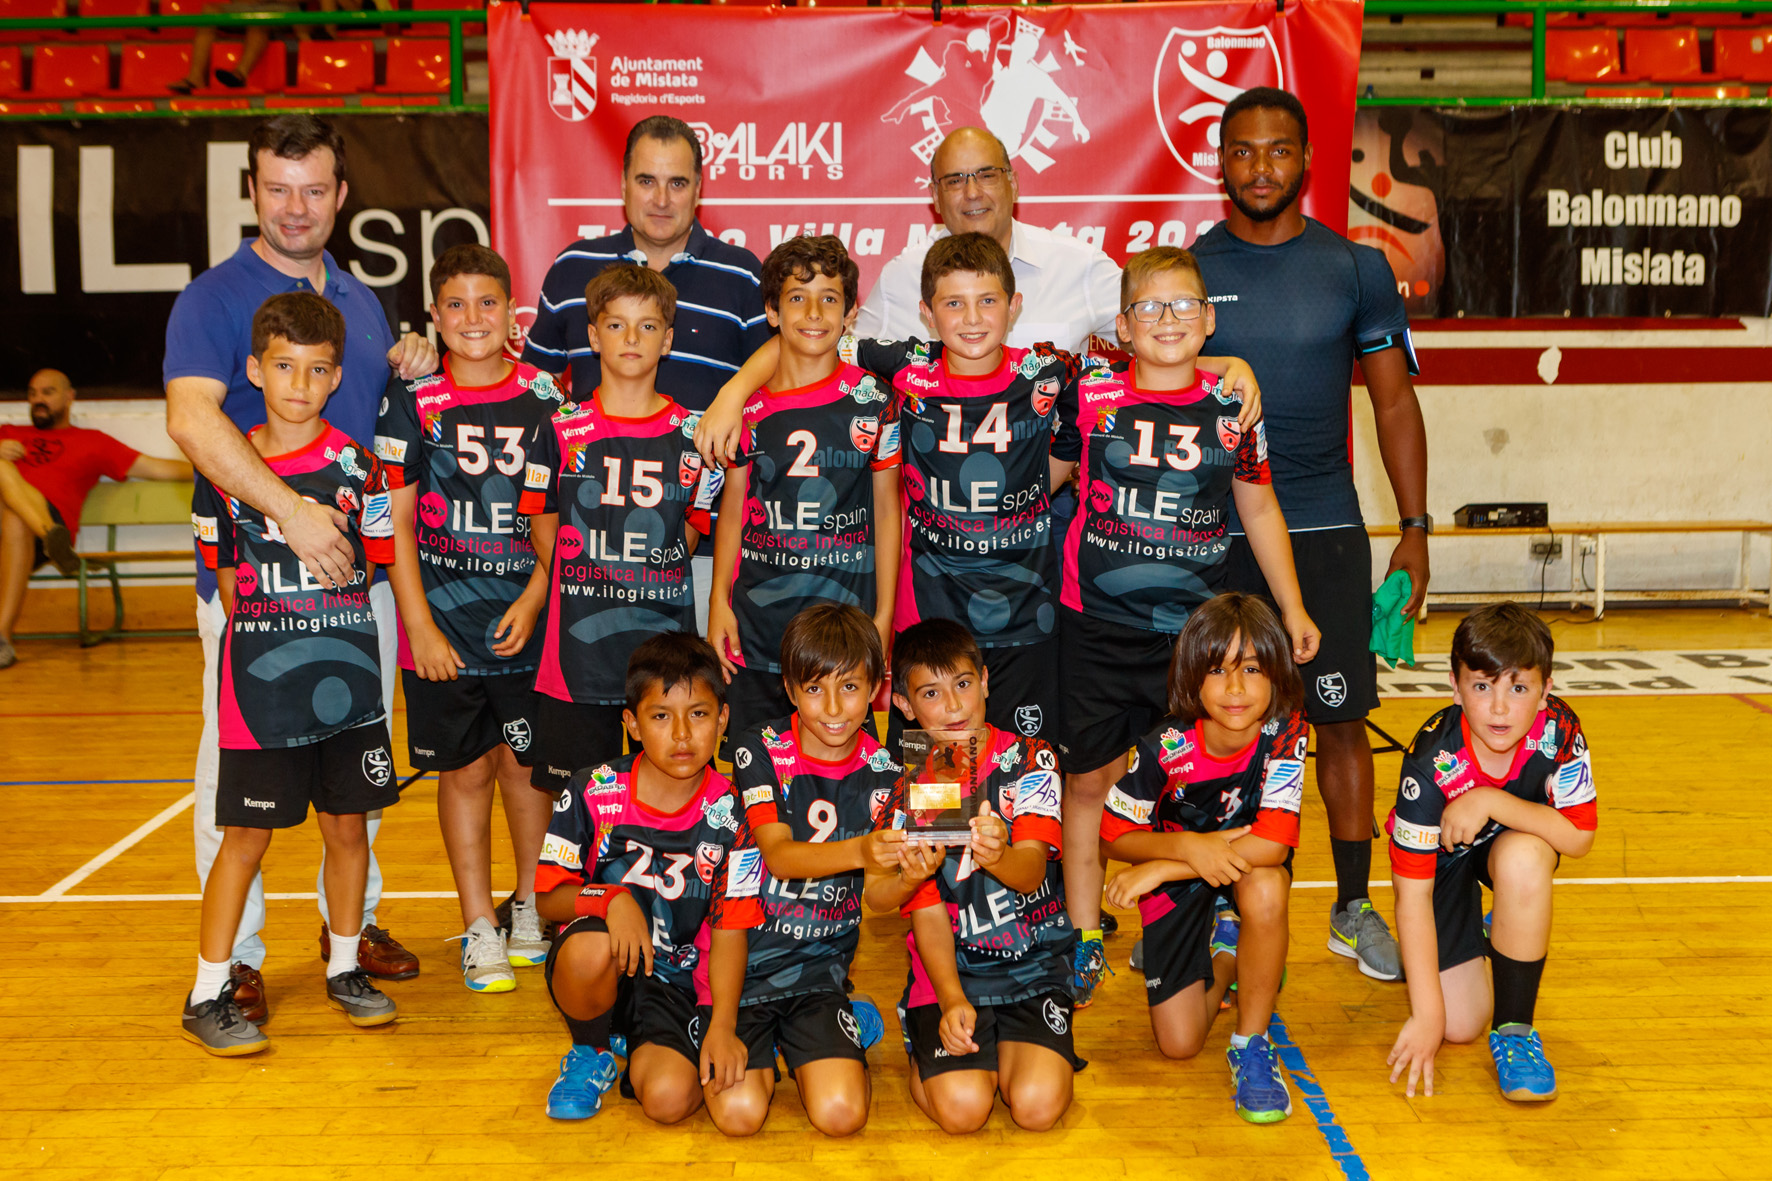 trofeo-de-balonmano-villa-de-mislata-2017-6